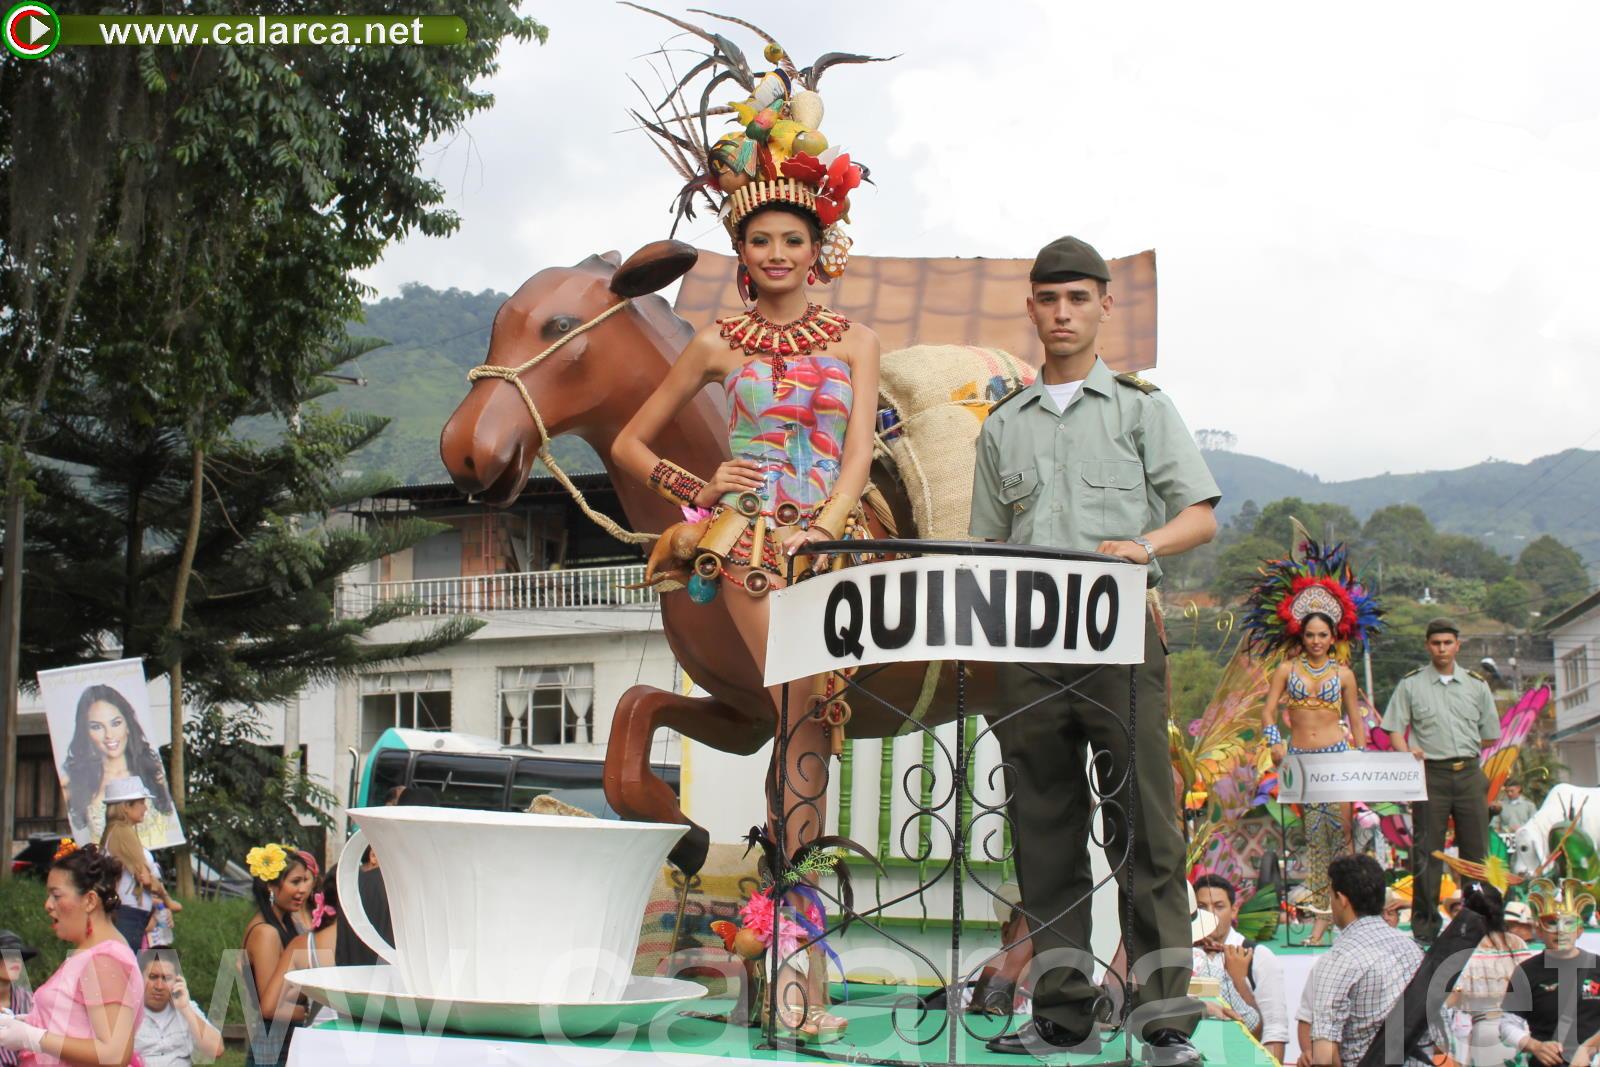 Quindío - Angie Licet Correa Granda